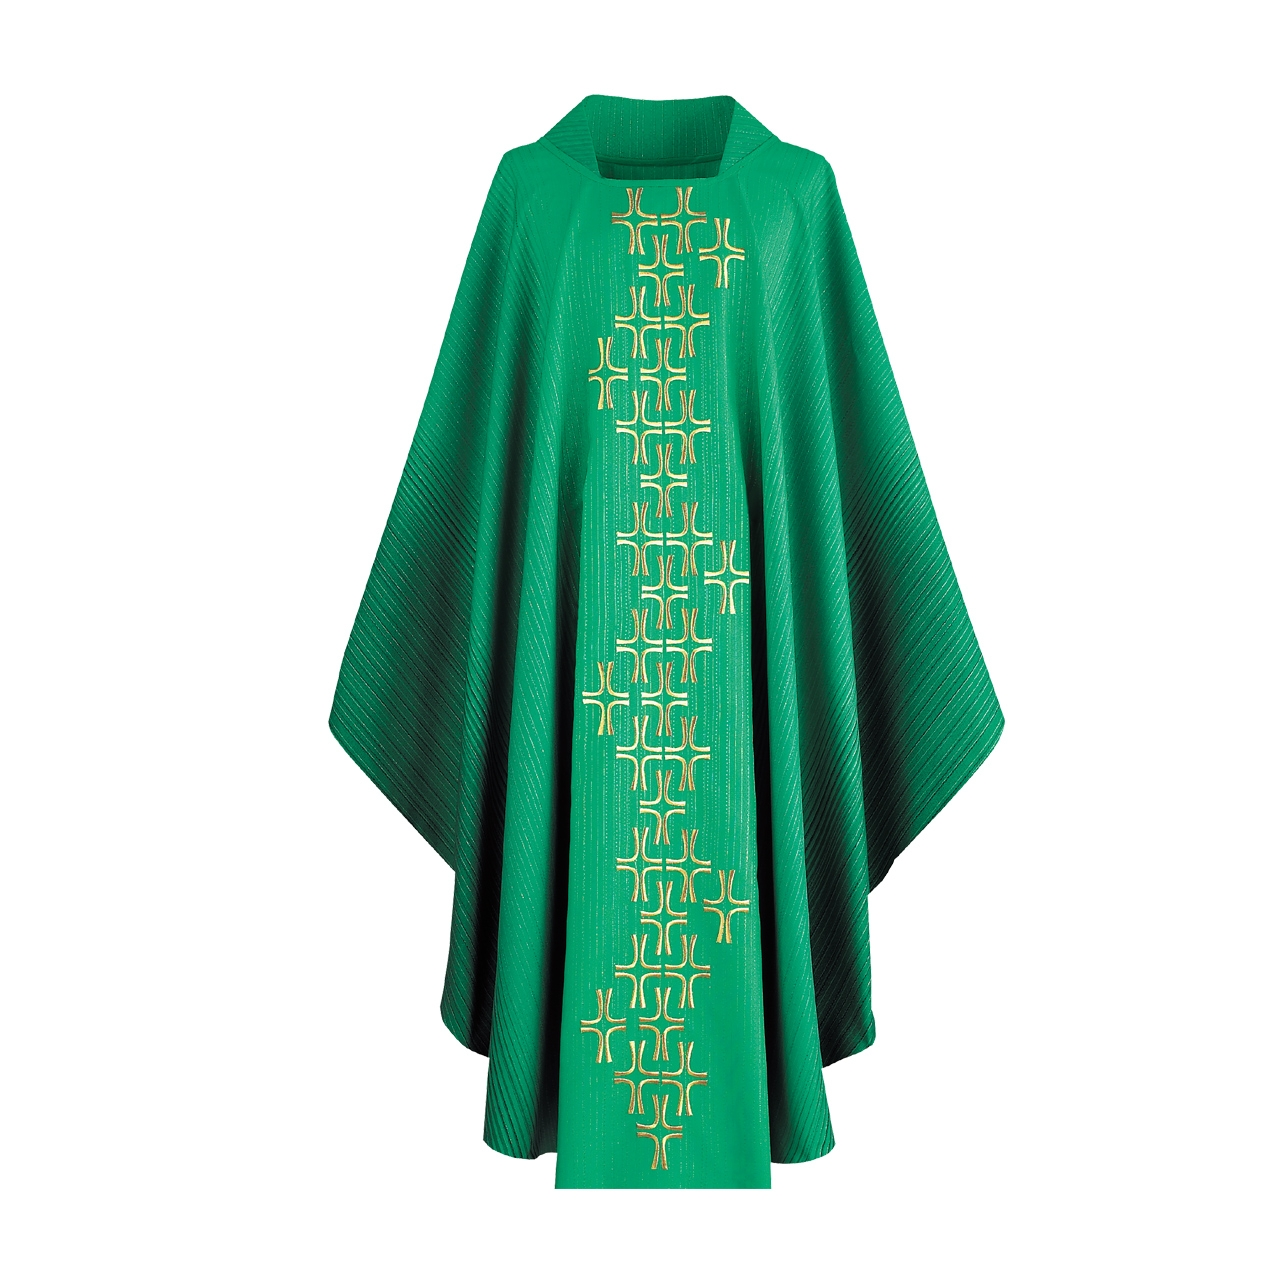 Grüne Kasel mit gesticktem Kreuzstab